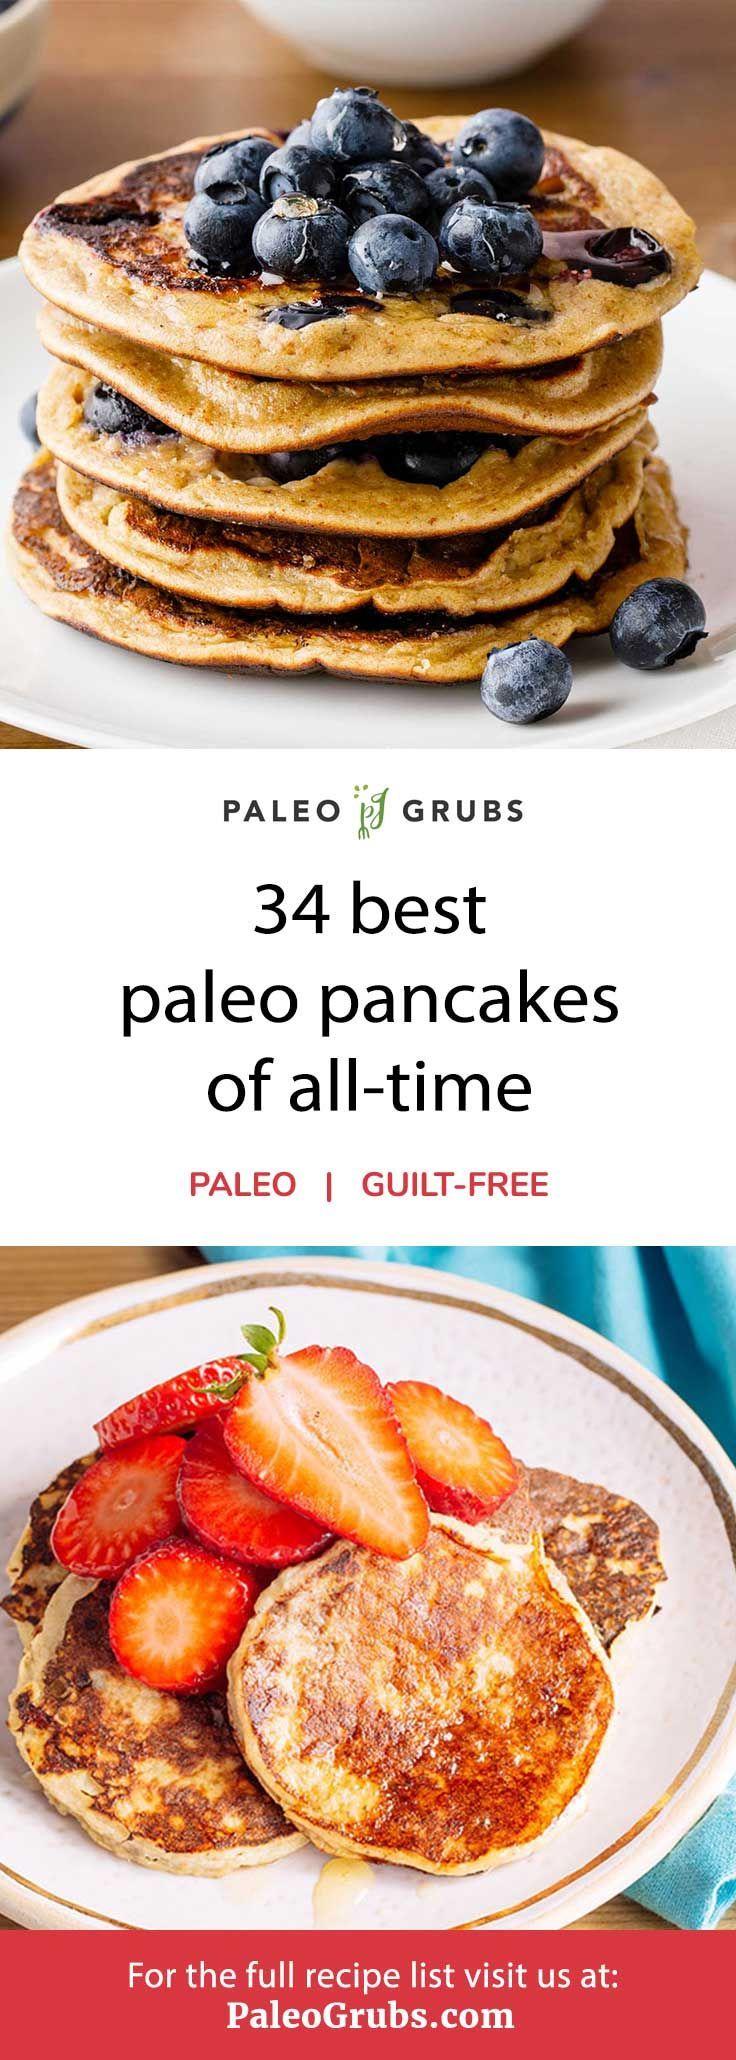 34 Best Paleo Pancakes of 2019 – Banana, Pumpkin, Coconut Flour + More